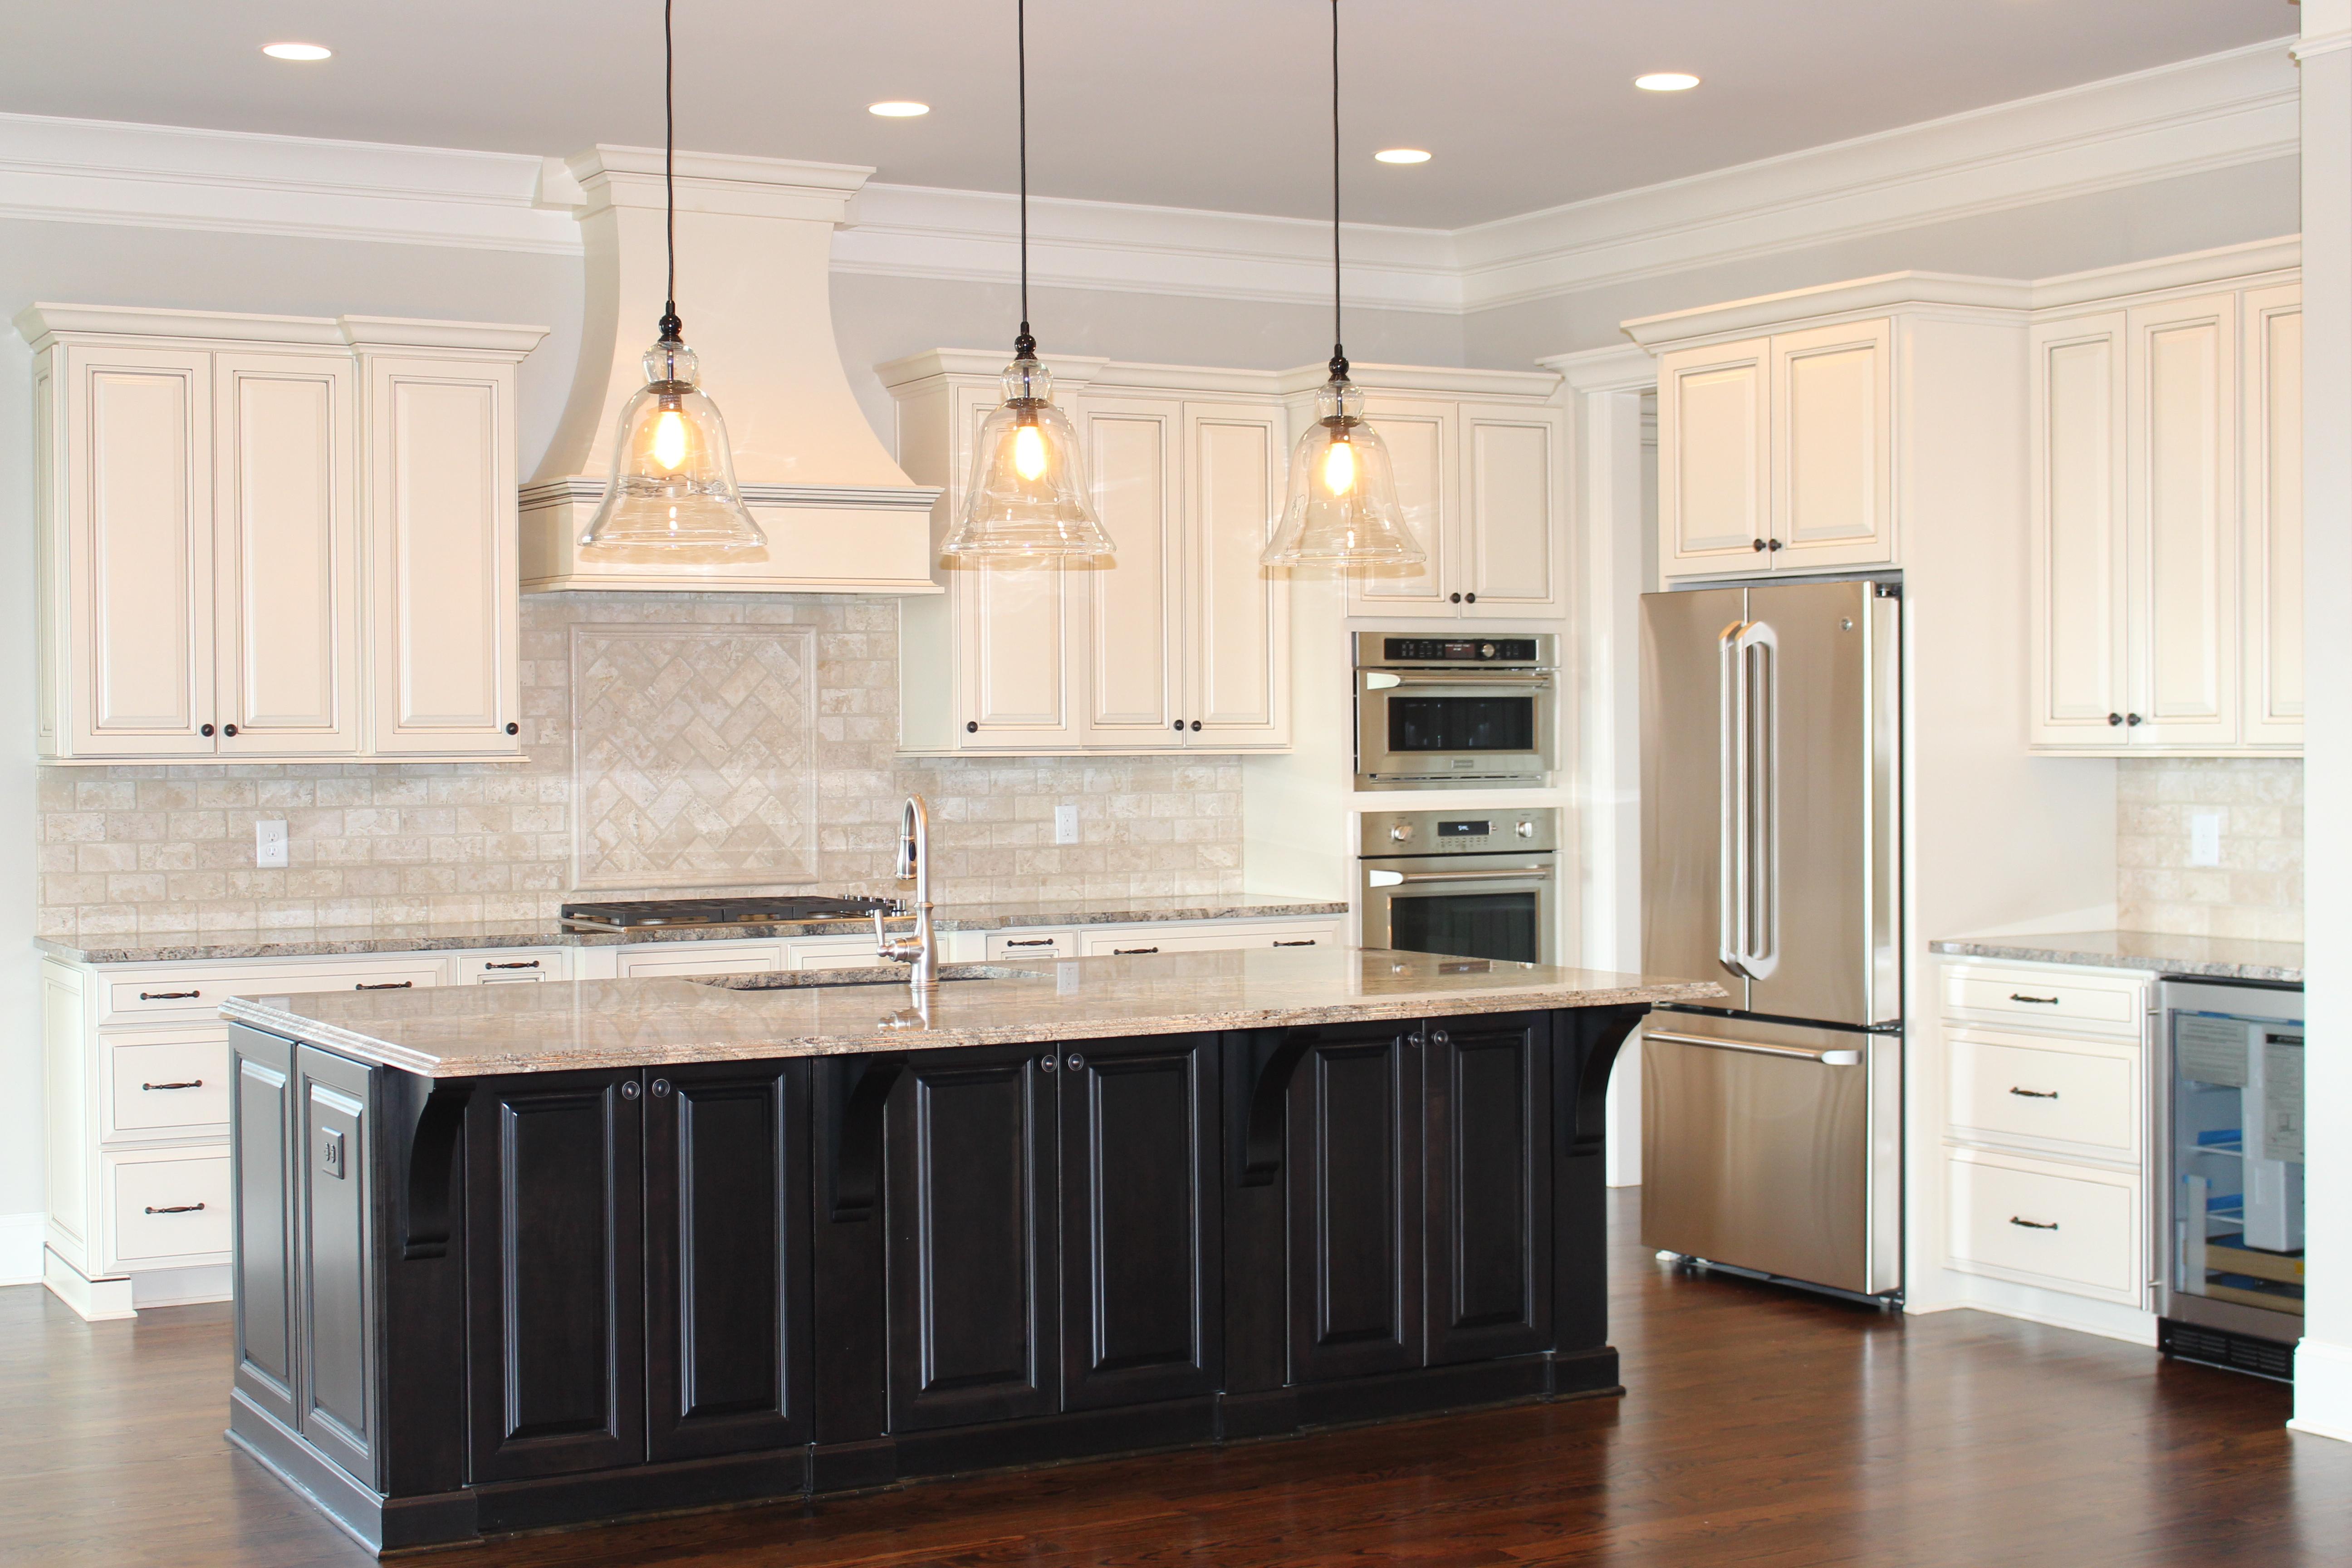 Lot 170 AR-kitchen